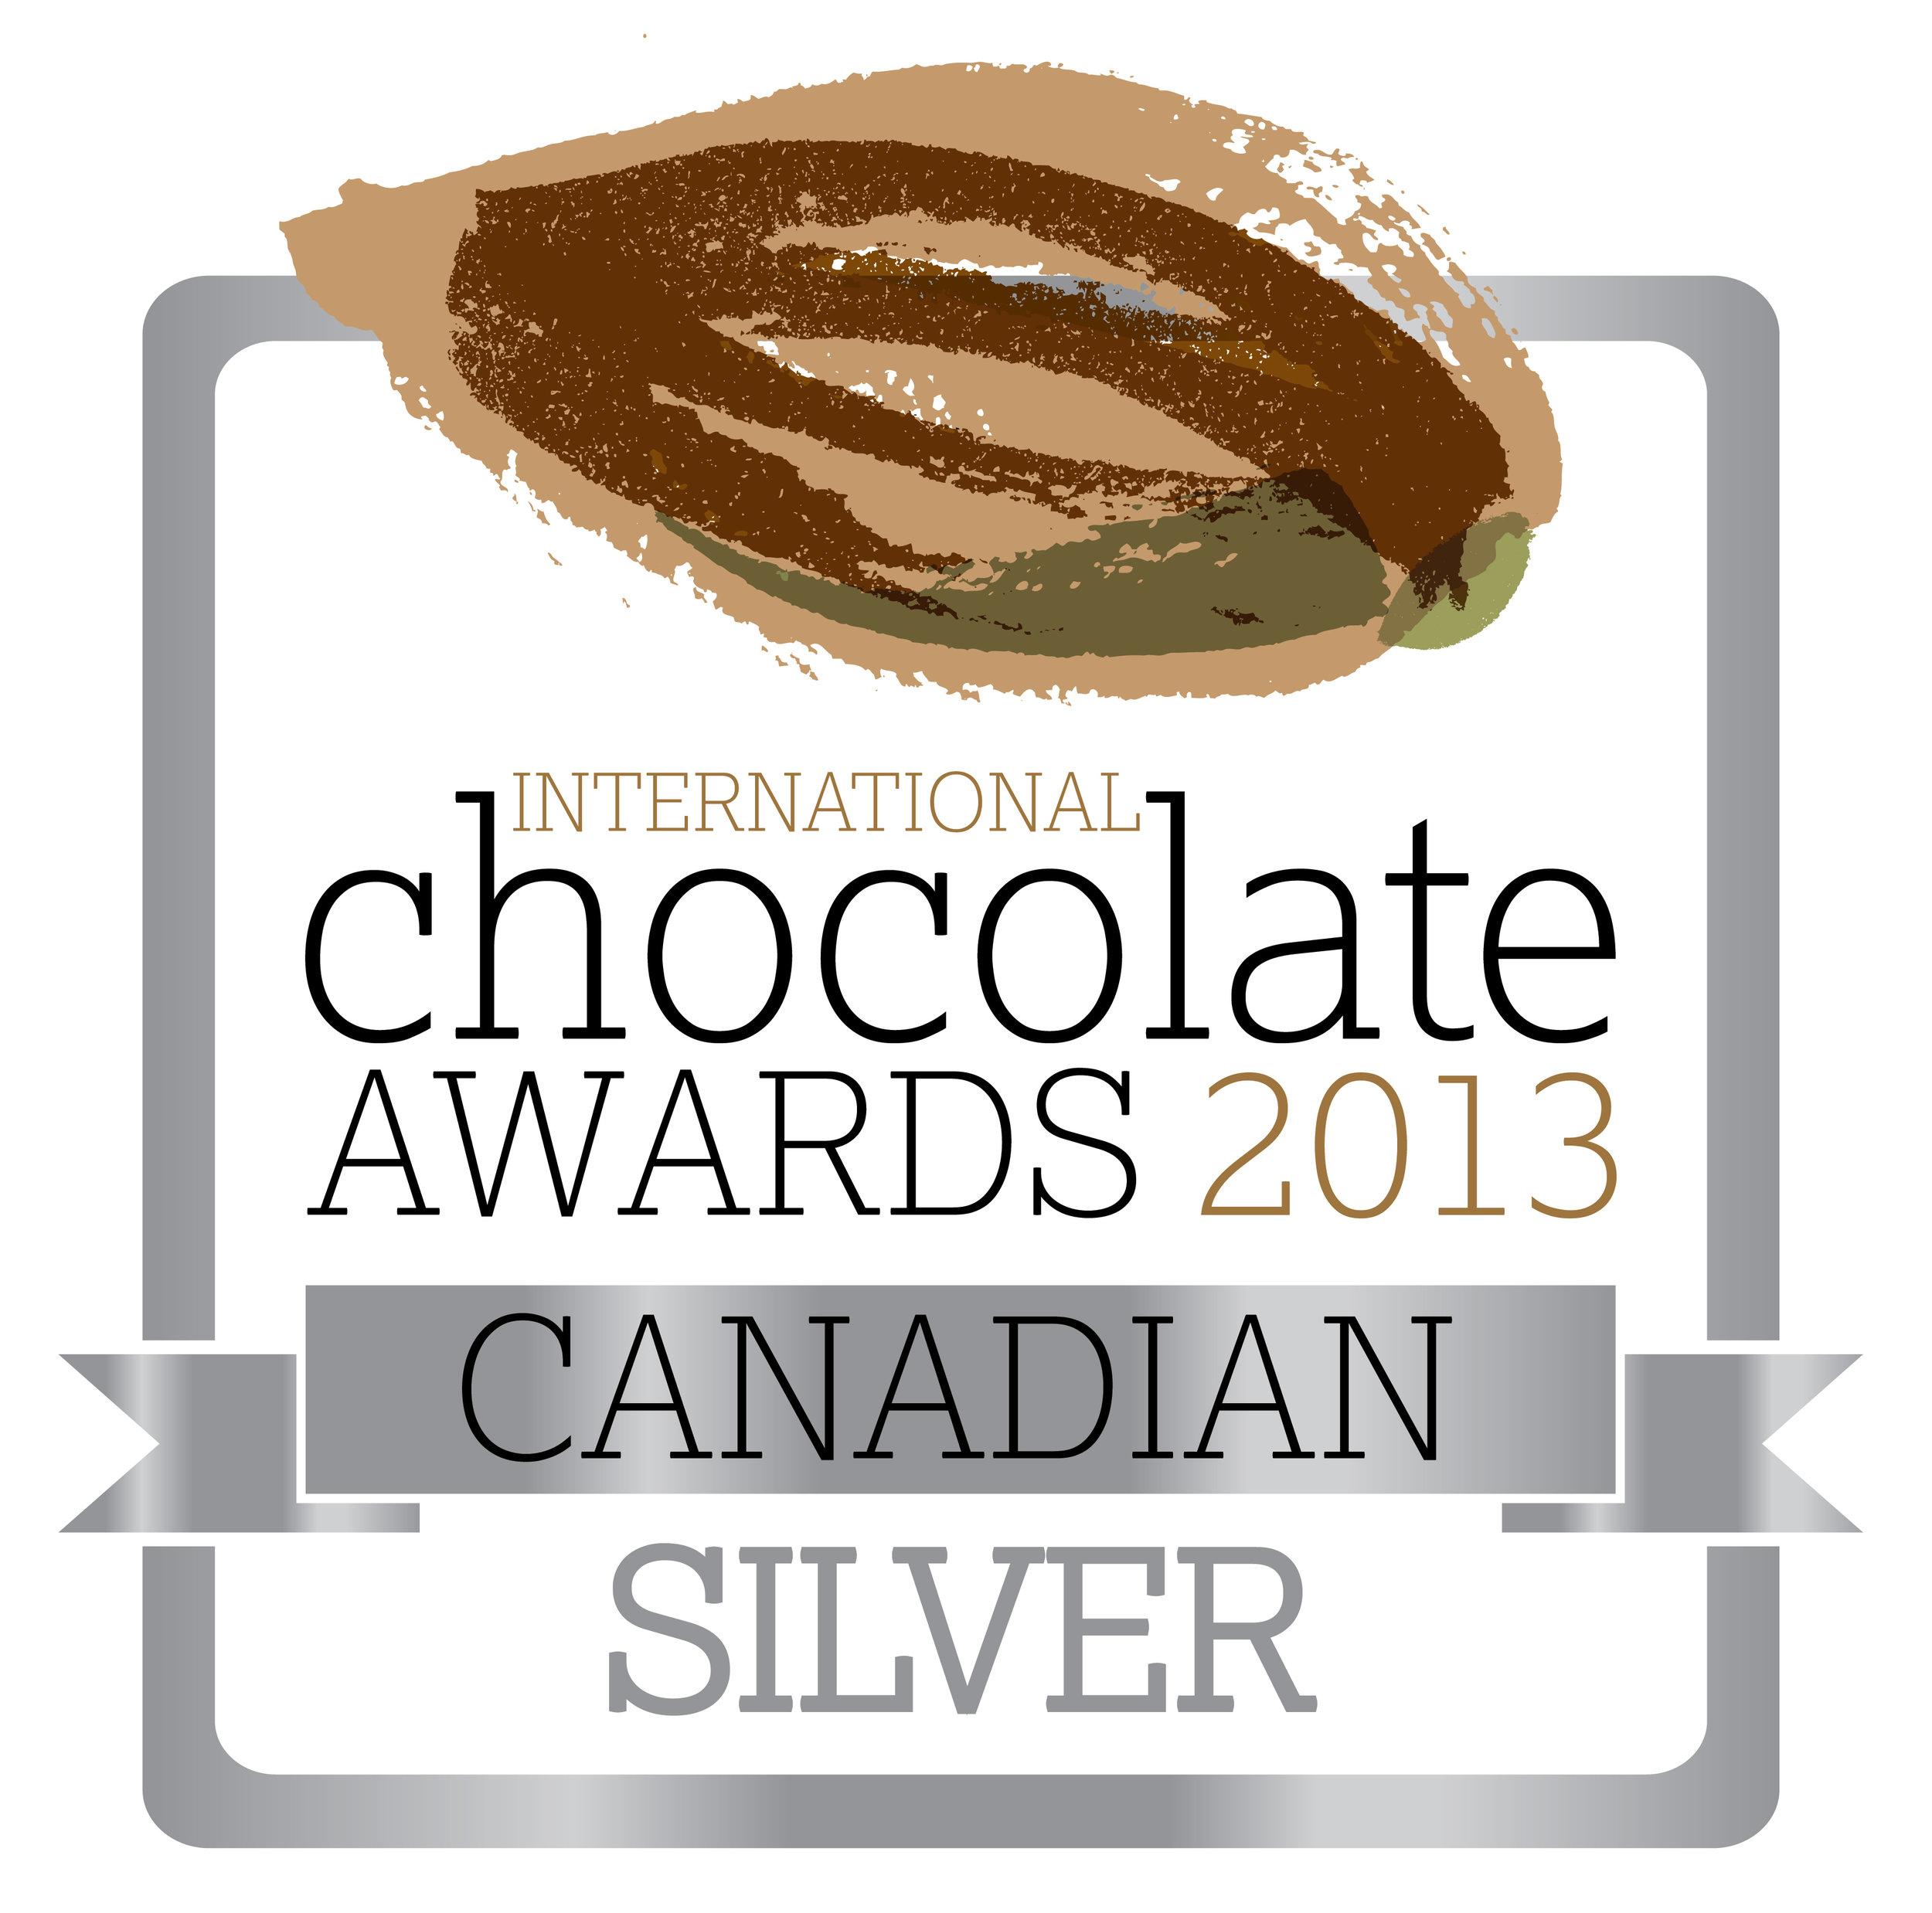 2013 International Chocolate Award winner